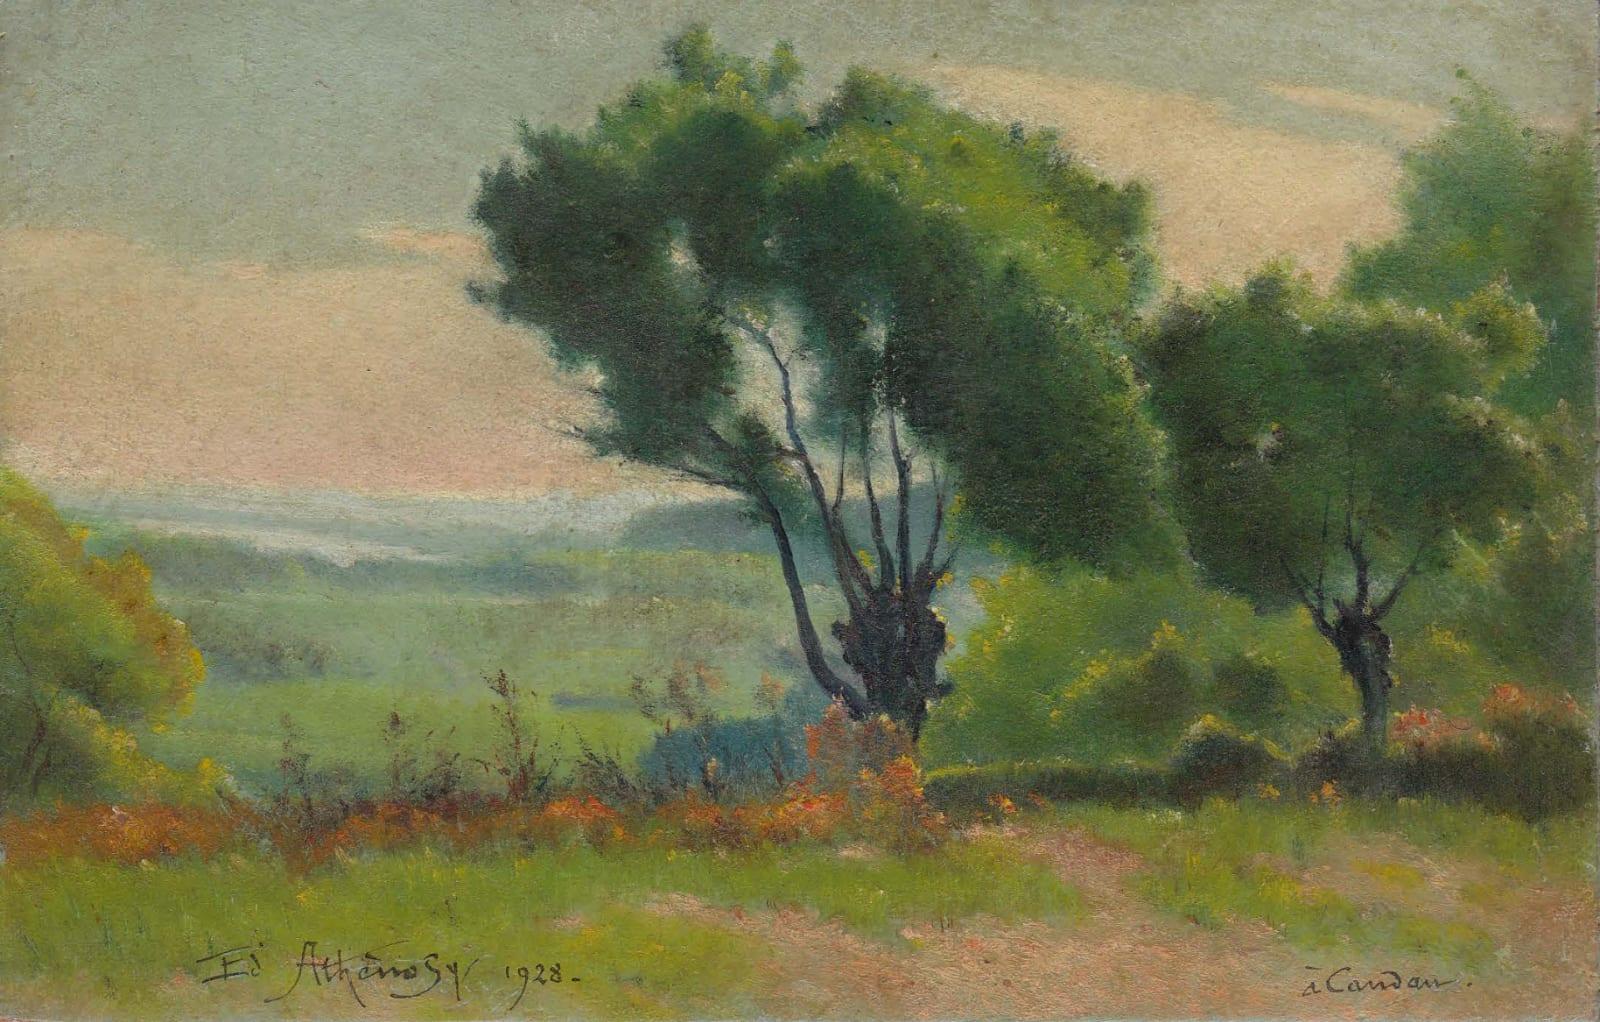 EDOUARD ATHÉNOSY, Inspired by Corot, 1928